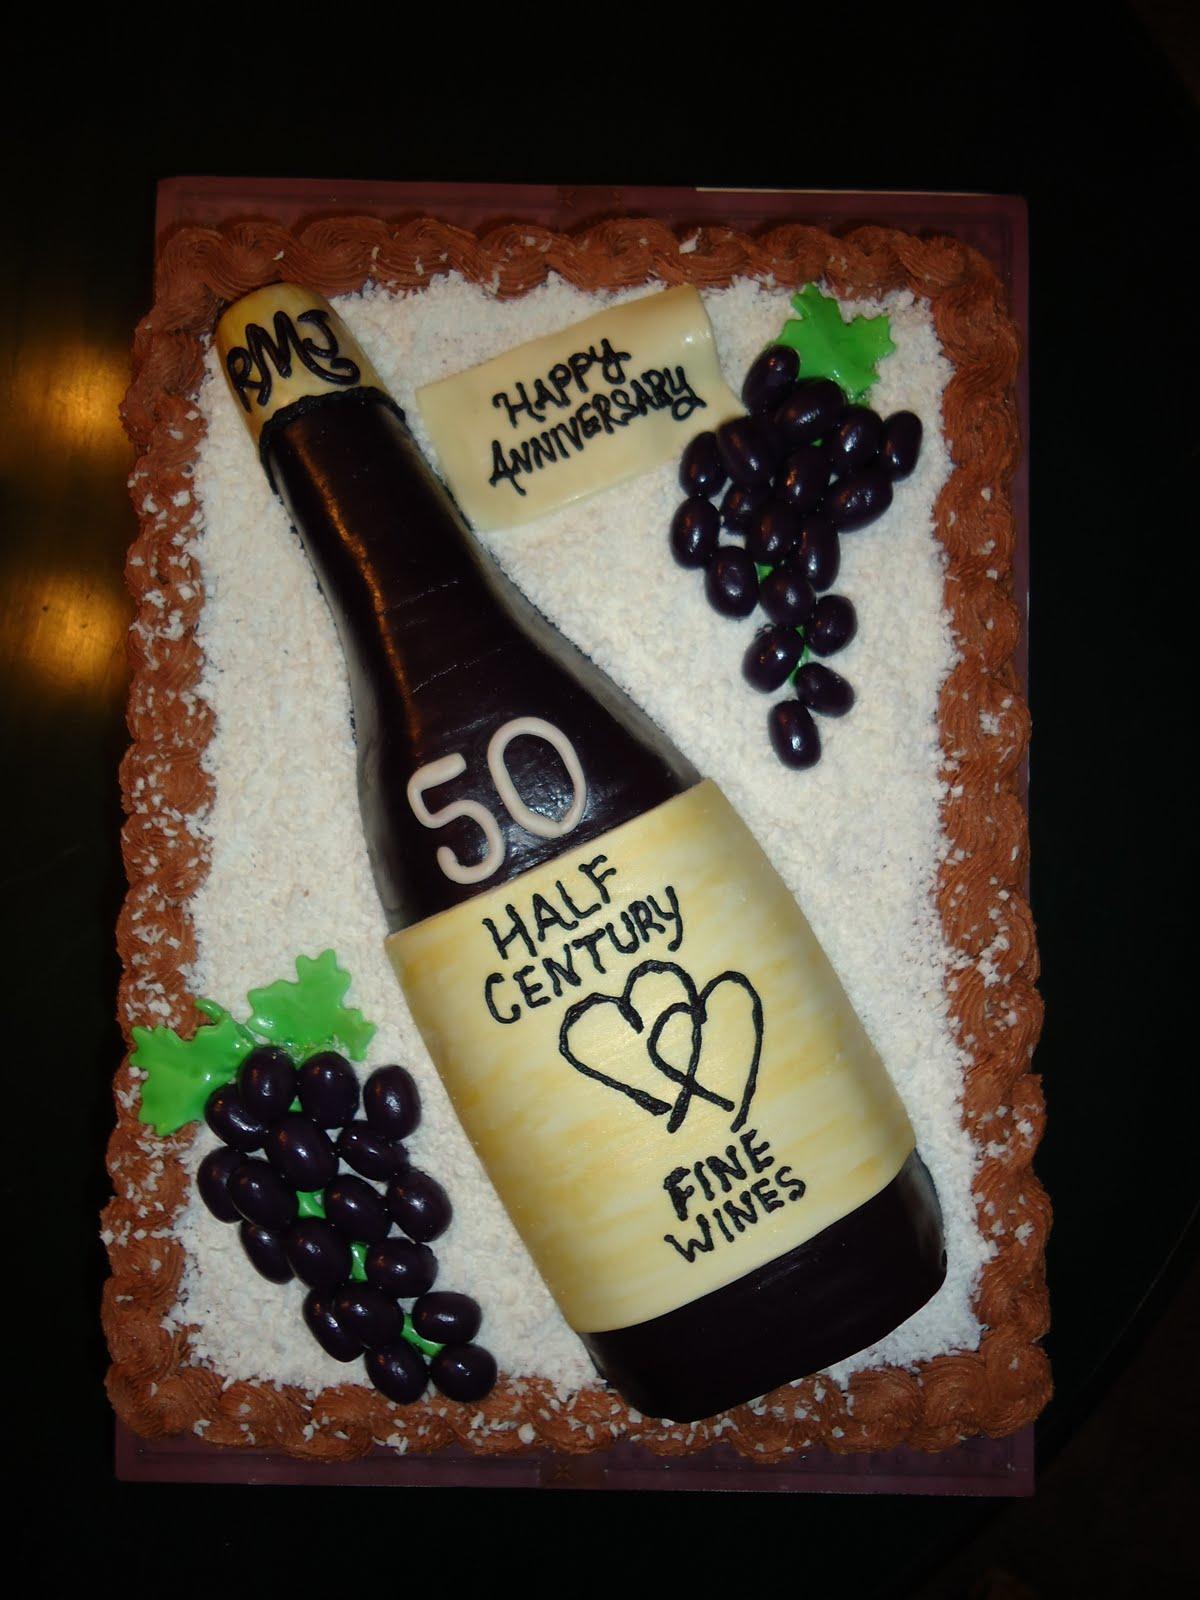 Astounding 7 Birthday Cakes Wine Bottle Glass Photo Wine Bottle Cake Funny Birthday Cards Online Unhofree Goldxyz